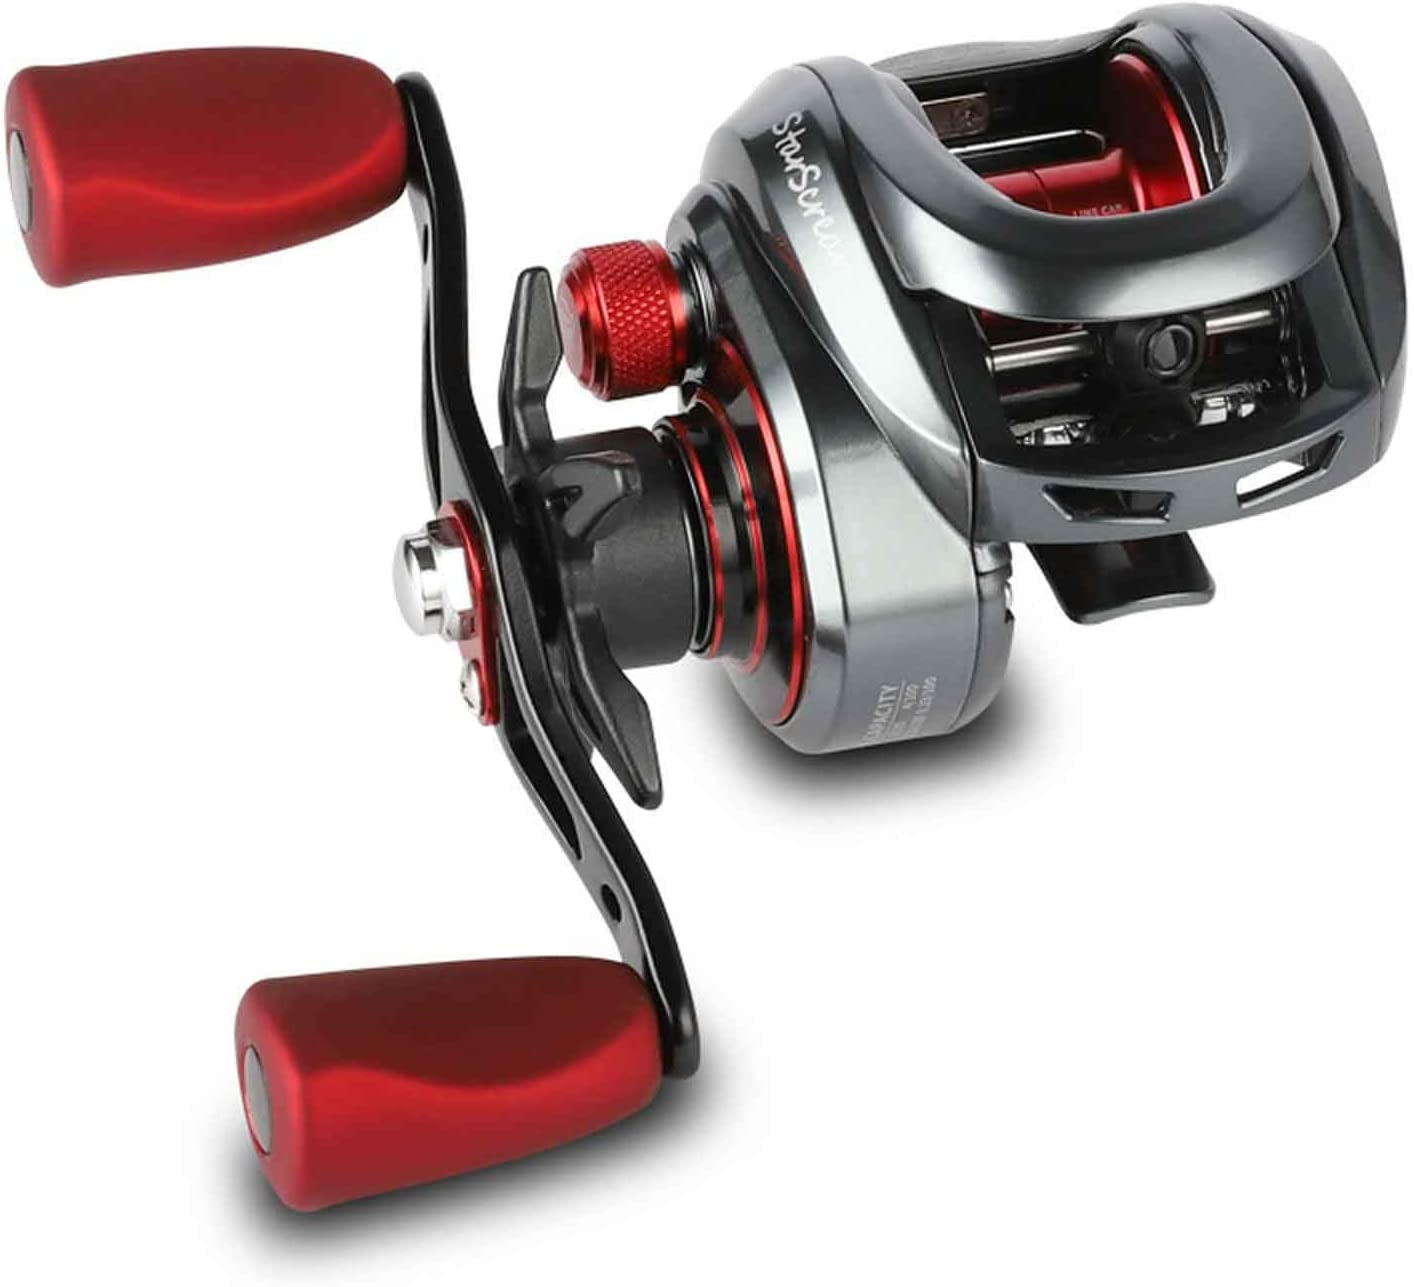 Carp Fishing Reel Anti-sea Water Wheel Regular Over item handling discount U-Shape Drop